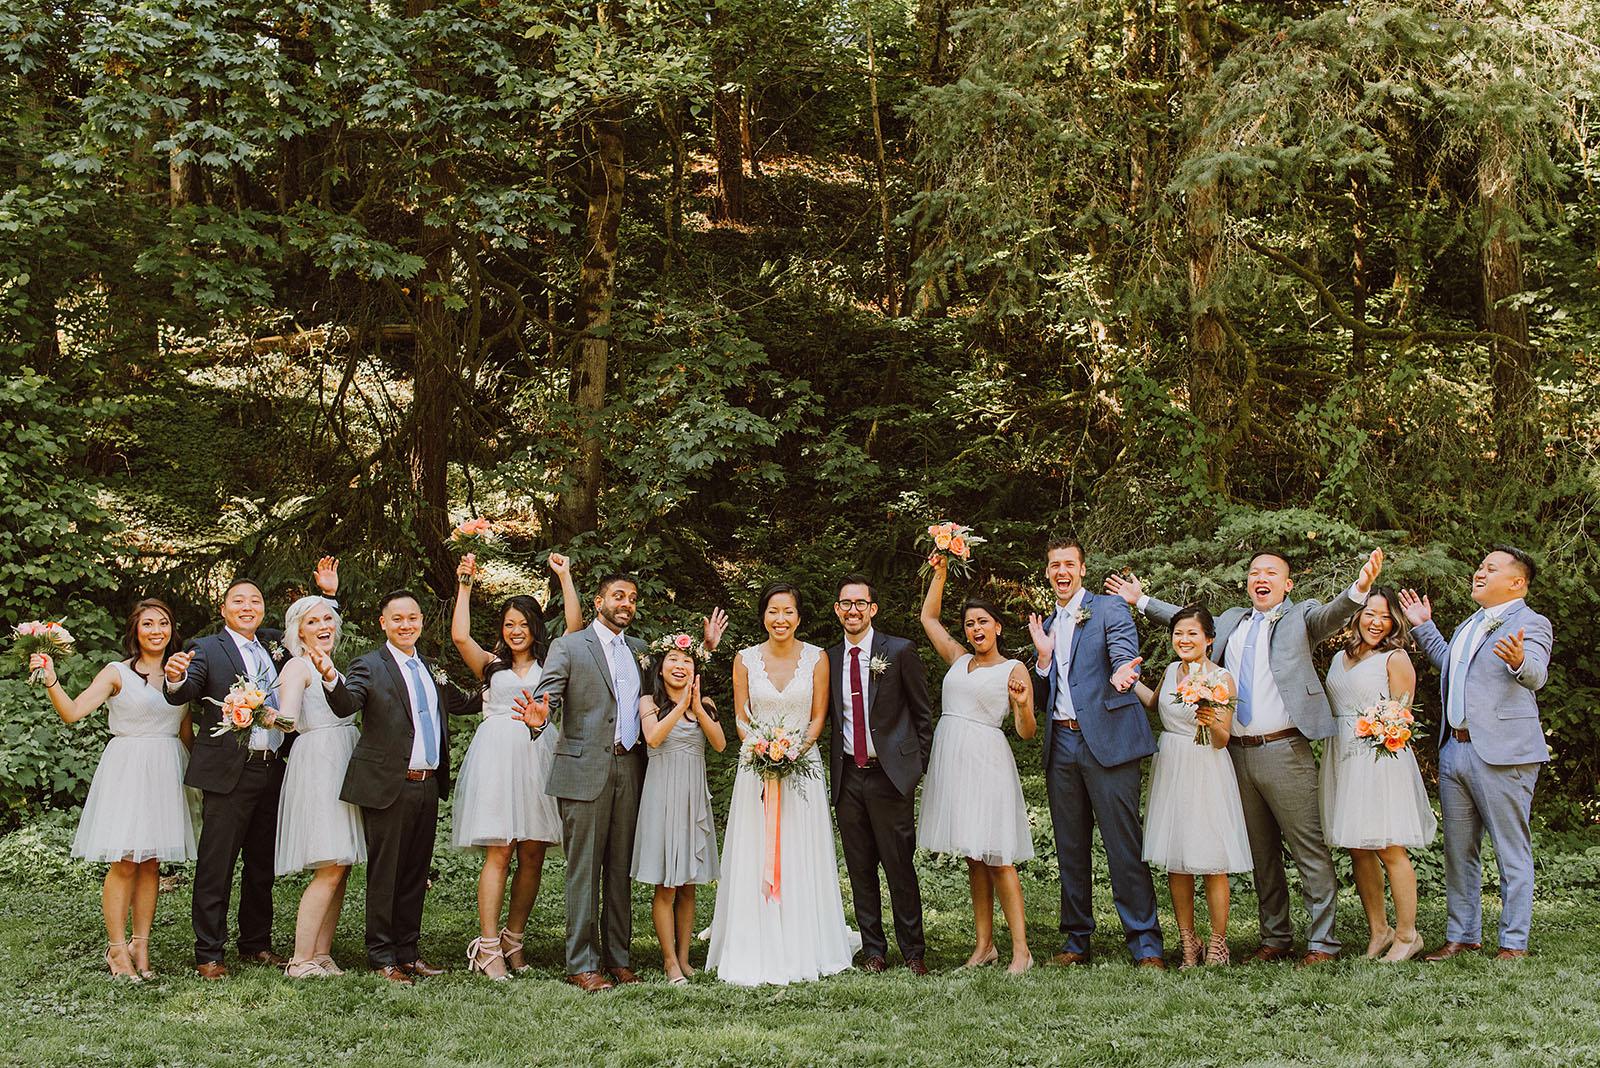 Wedding party cheering before the ceremony | Portland Castaway Wedding